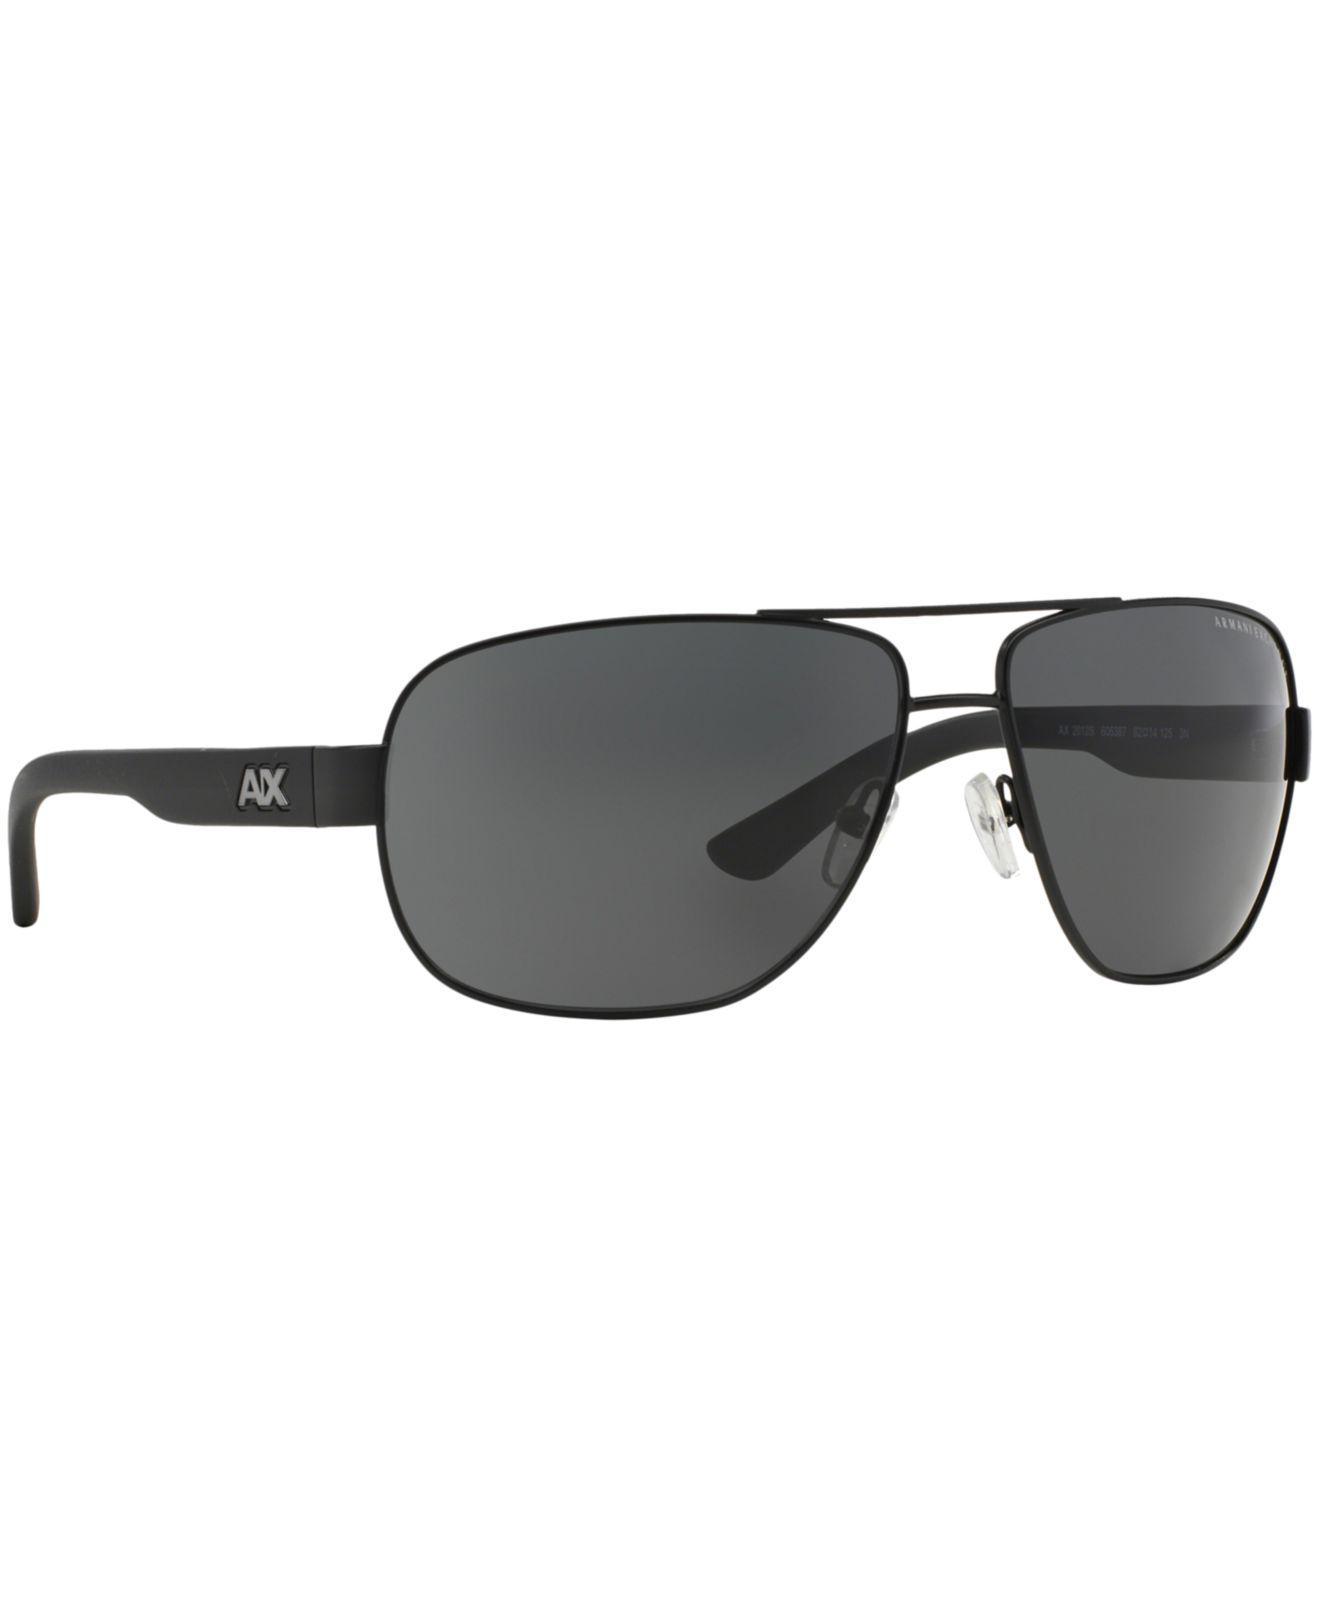 68d81f848 Armani Exchange - Black Ax Ax2012s 62 for Men - Lyst. View fullscreen